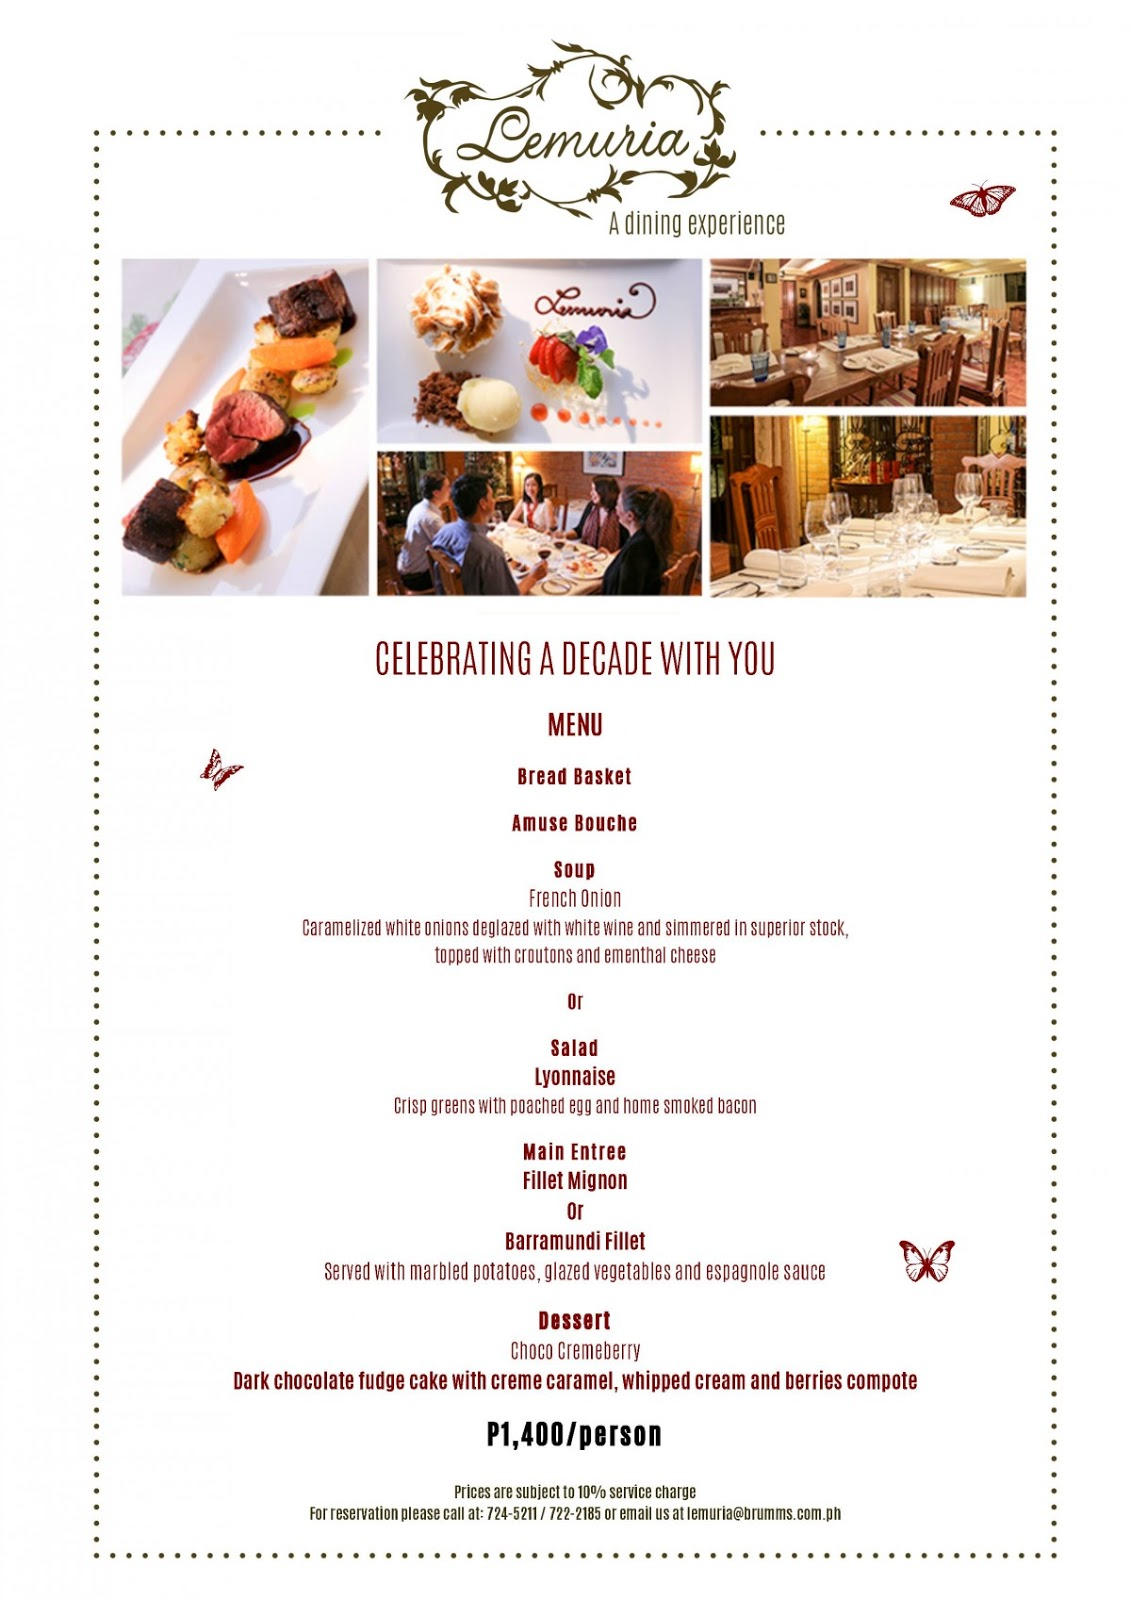 Lemuria Gourmet Restaurant Menu